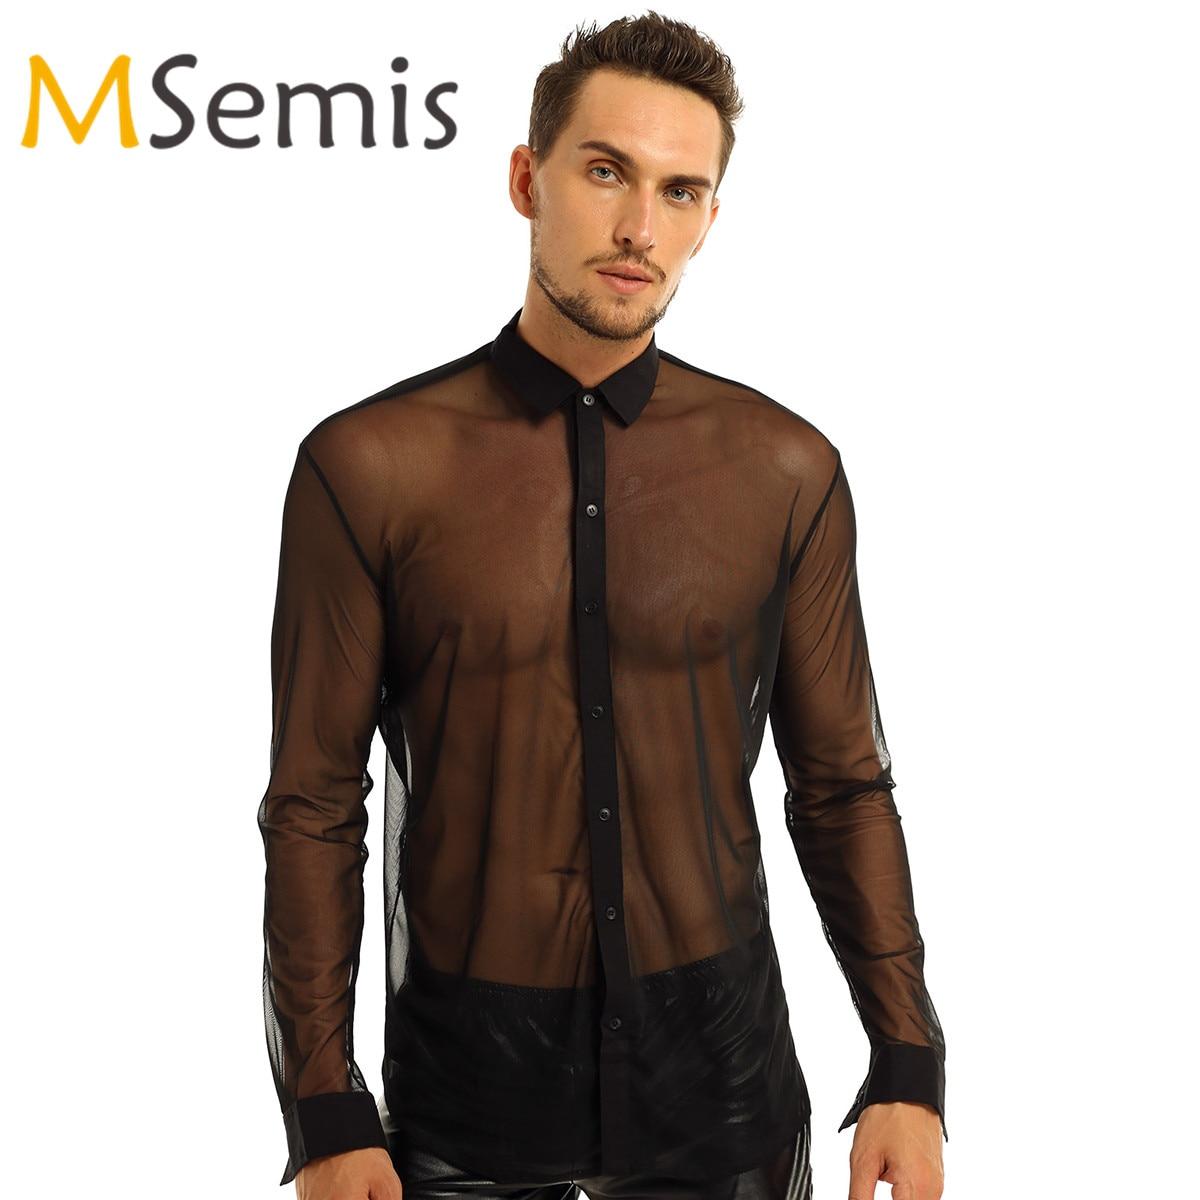 MSemis Mesh Transparent Long Sleeves Turtle Neck Leotard Bodysuit Romper Jumpsuit